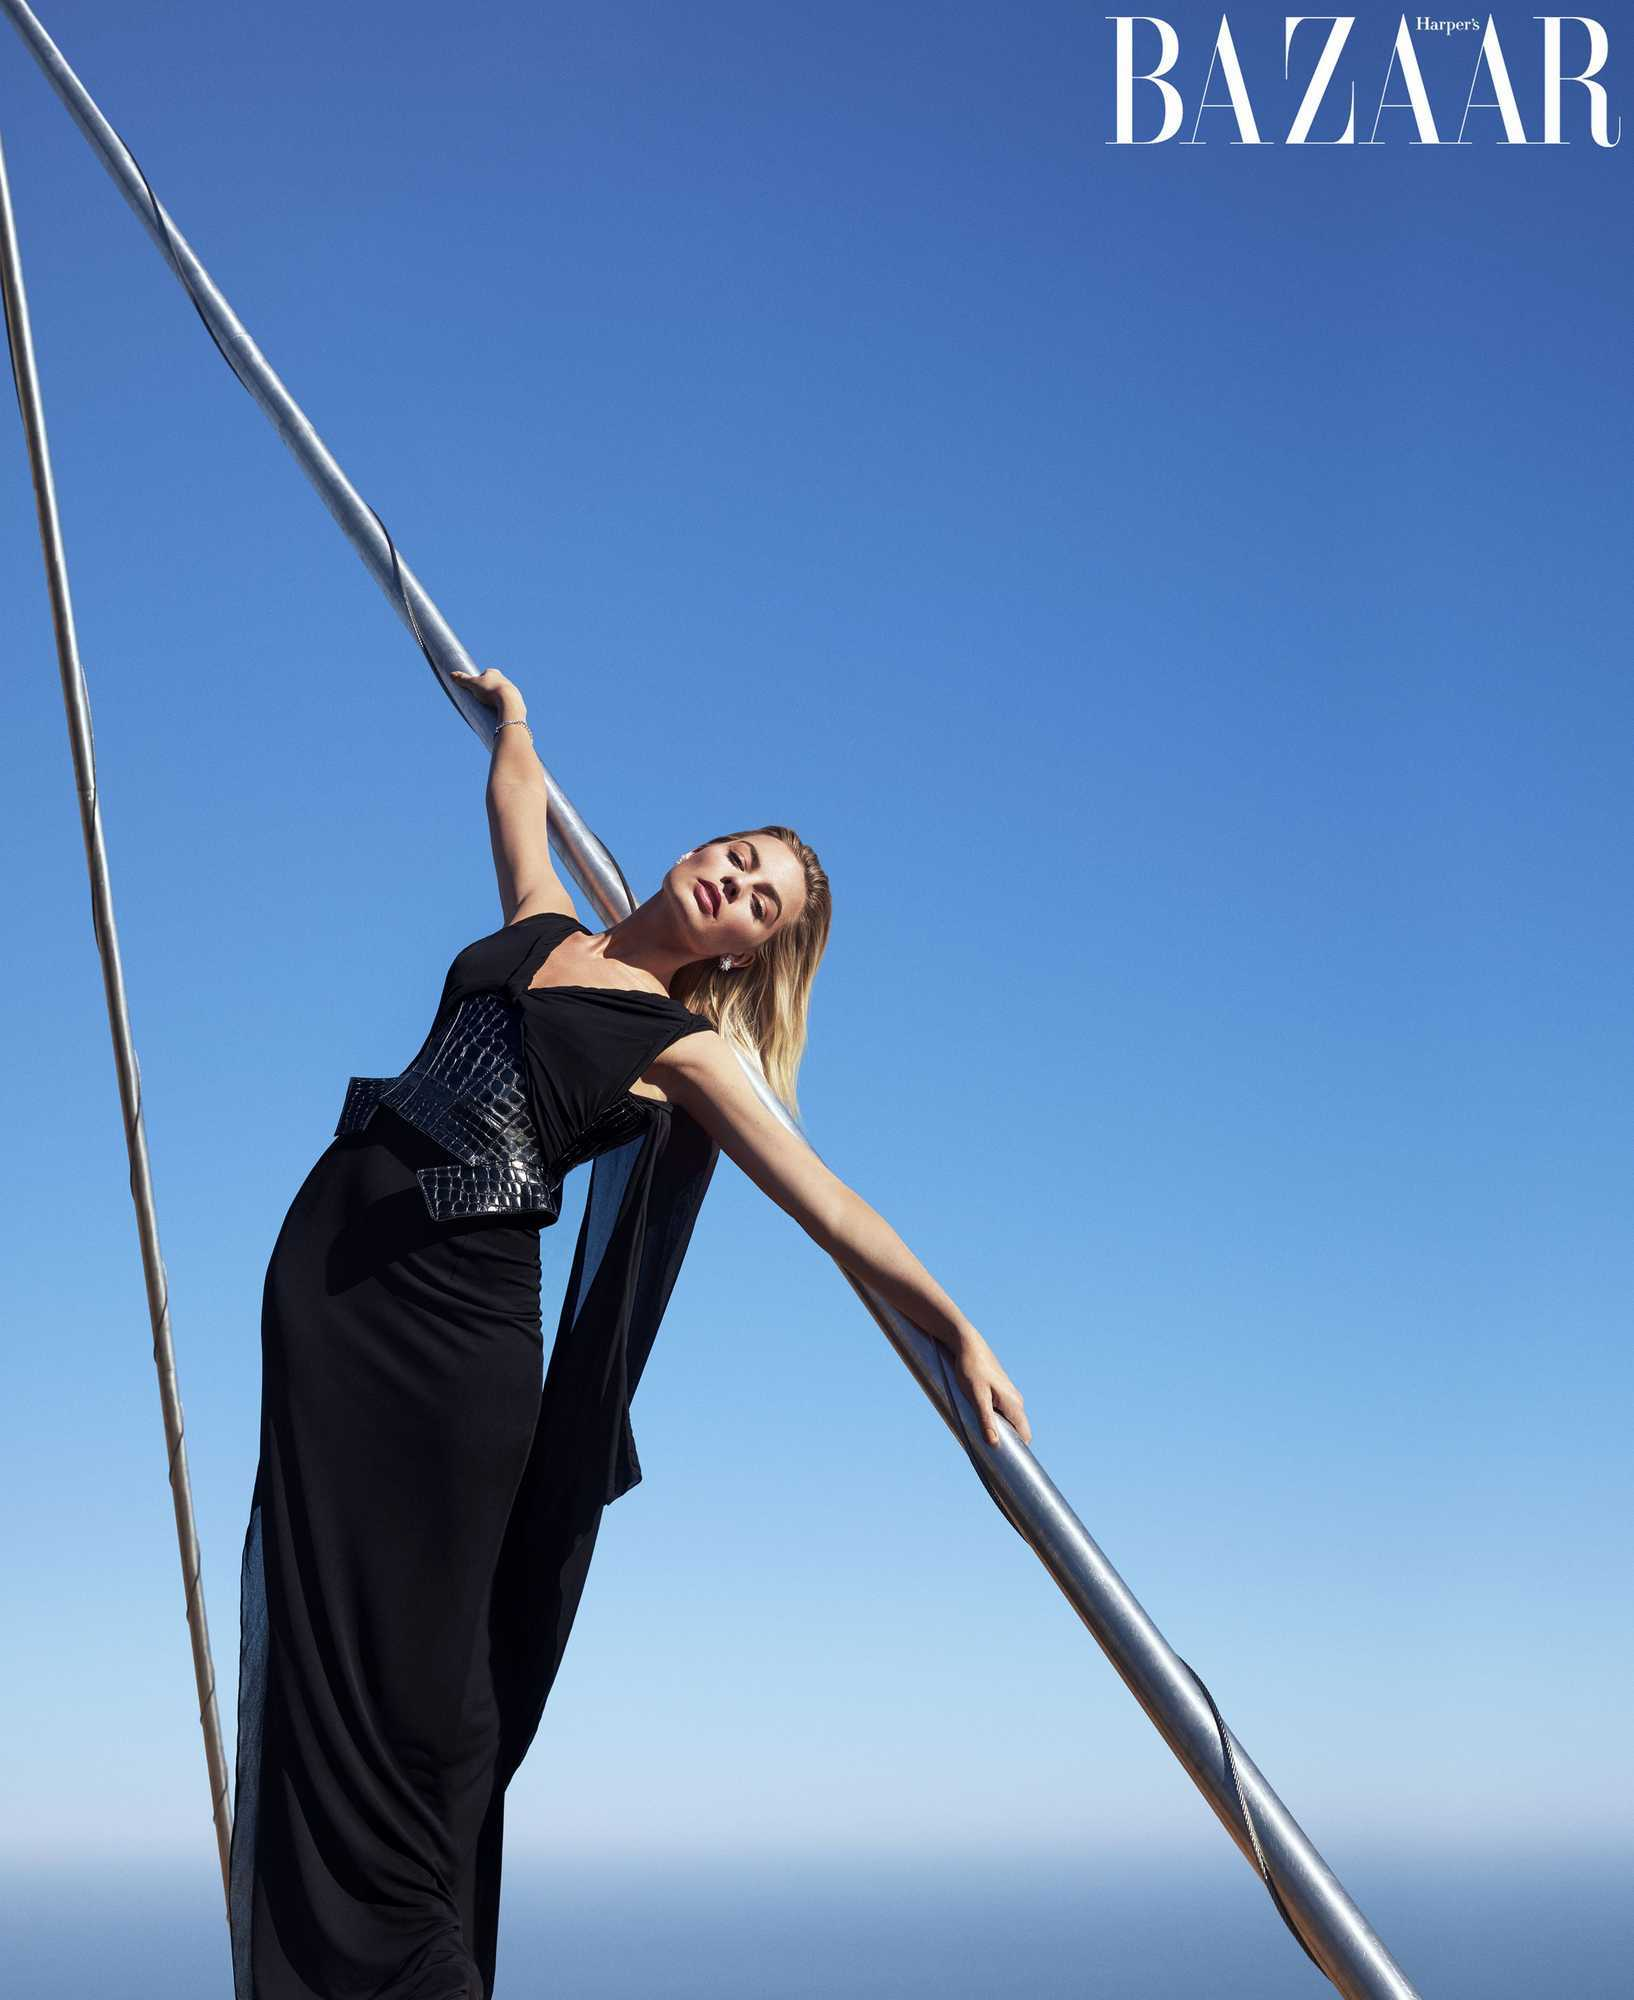 Margot-Robbie-Harpers-Bazaar-US-Magazine-December-2018January-20195.jpg